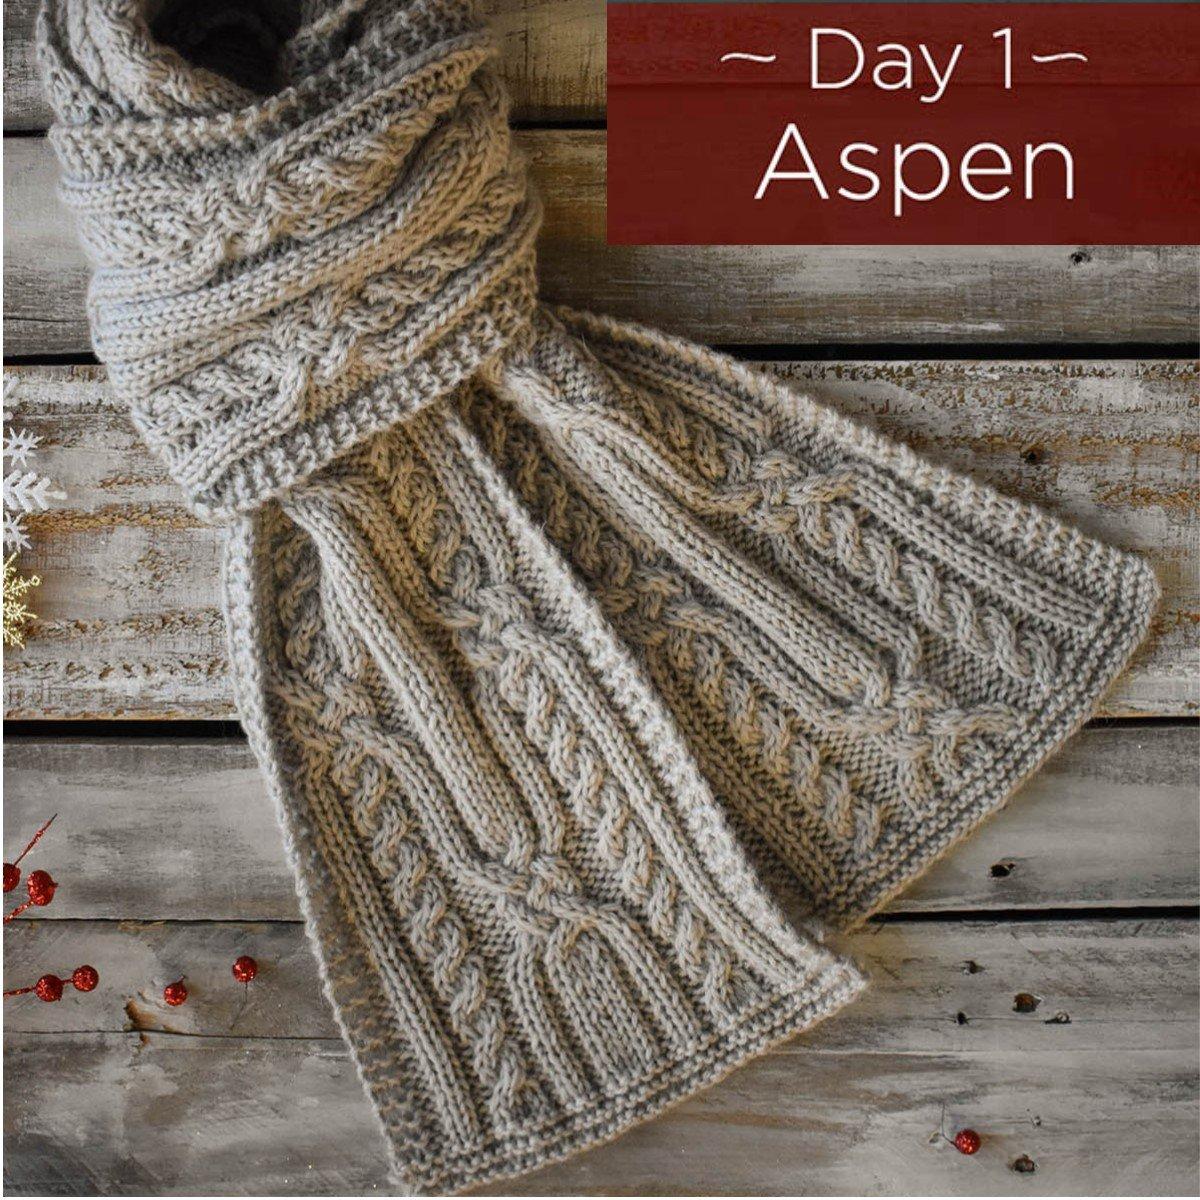 Aspen Scarf Kit - Day 1